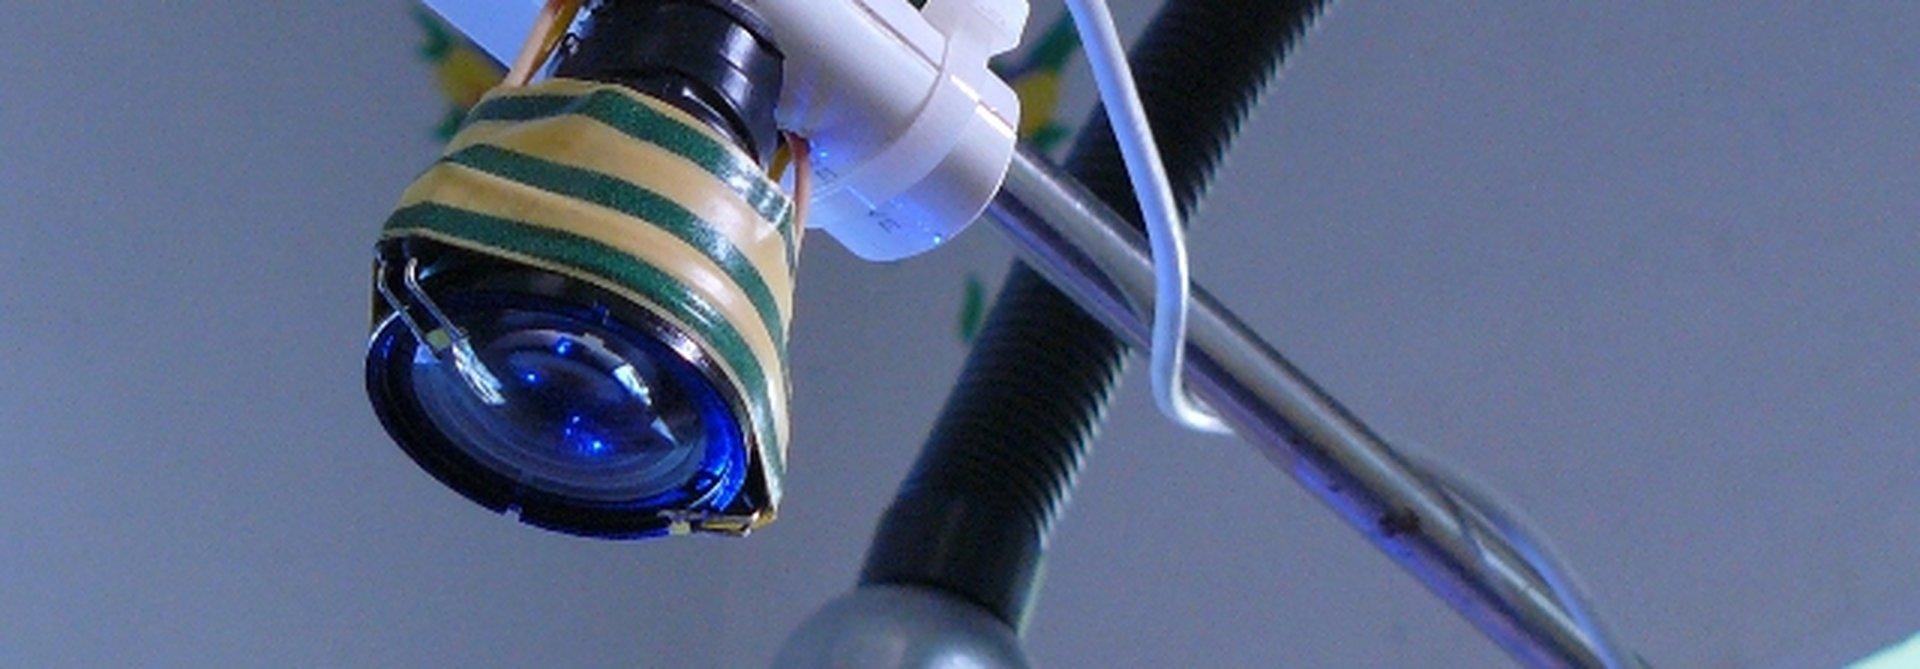 Web kamera ako jednoduchý mikroskop post thumbnail image